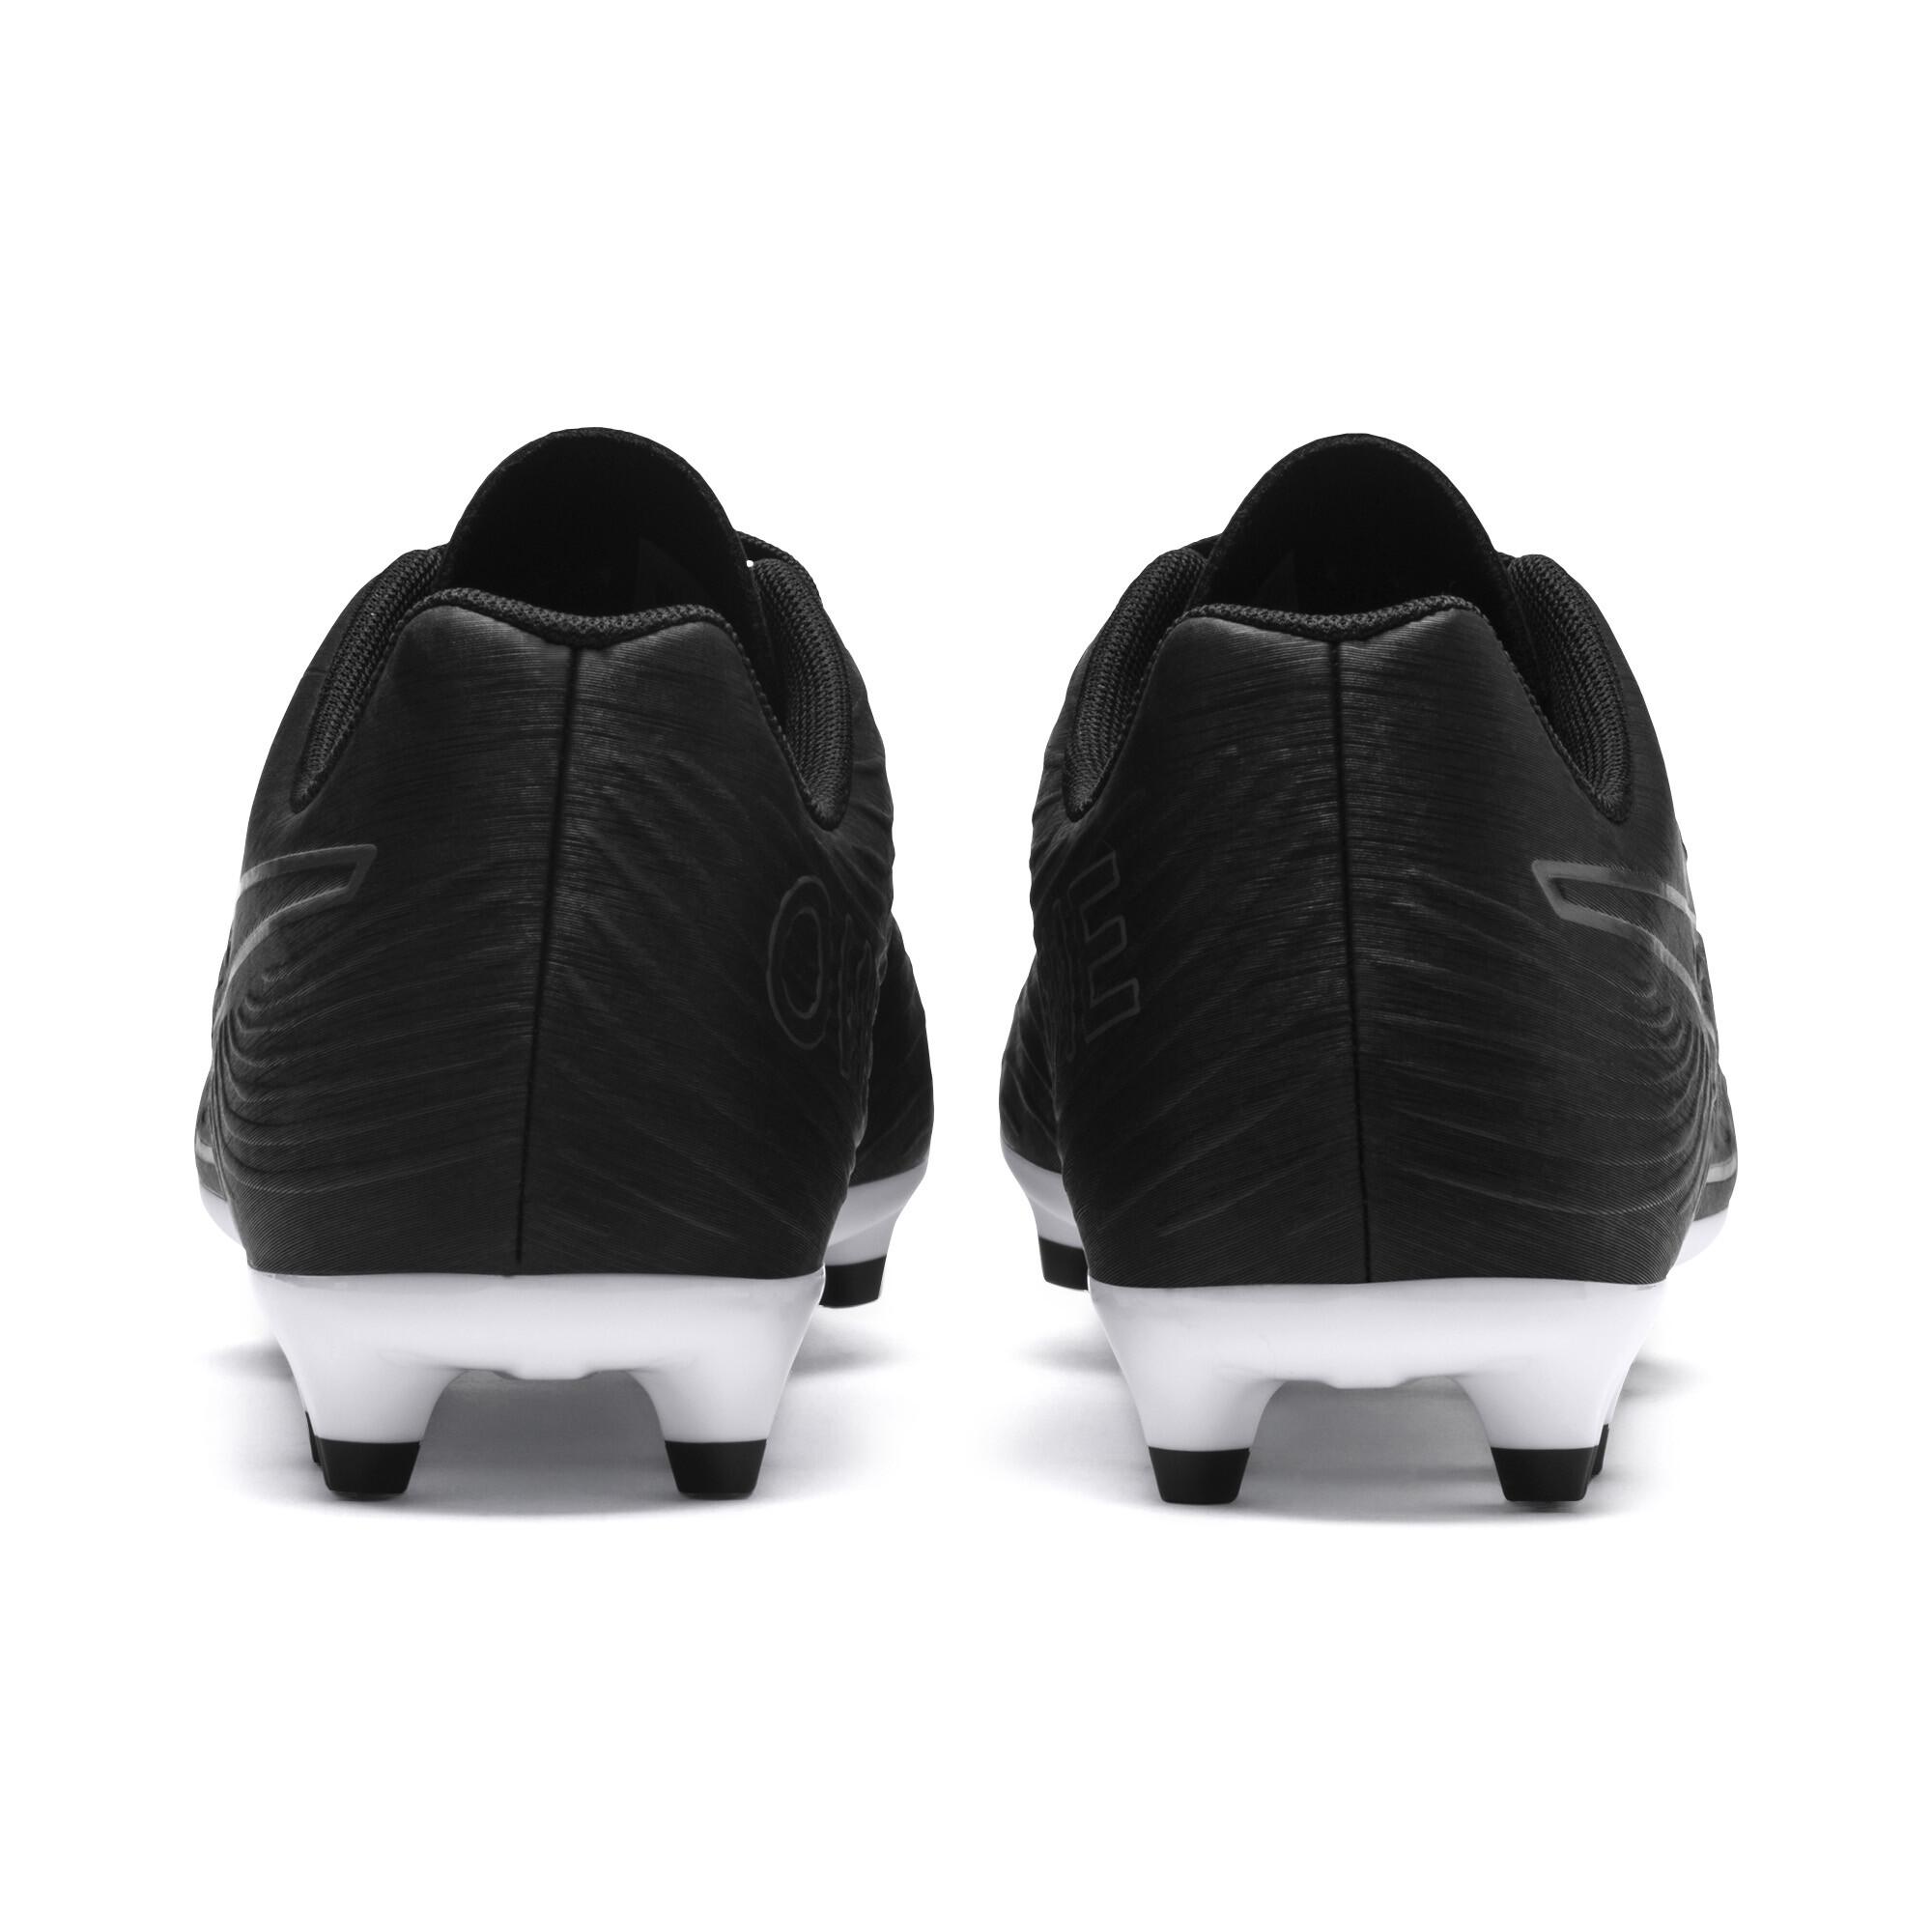 Image Puma PUMA ONE 19.4 FG/AG Men's Football Boots #3